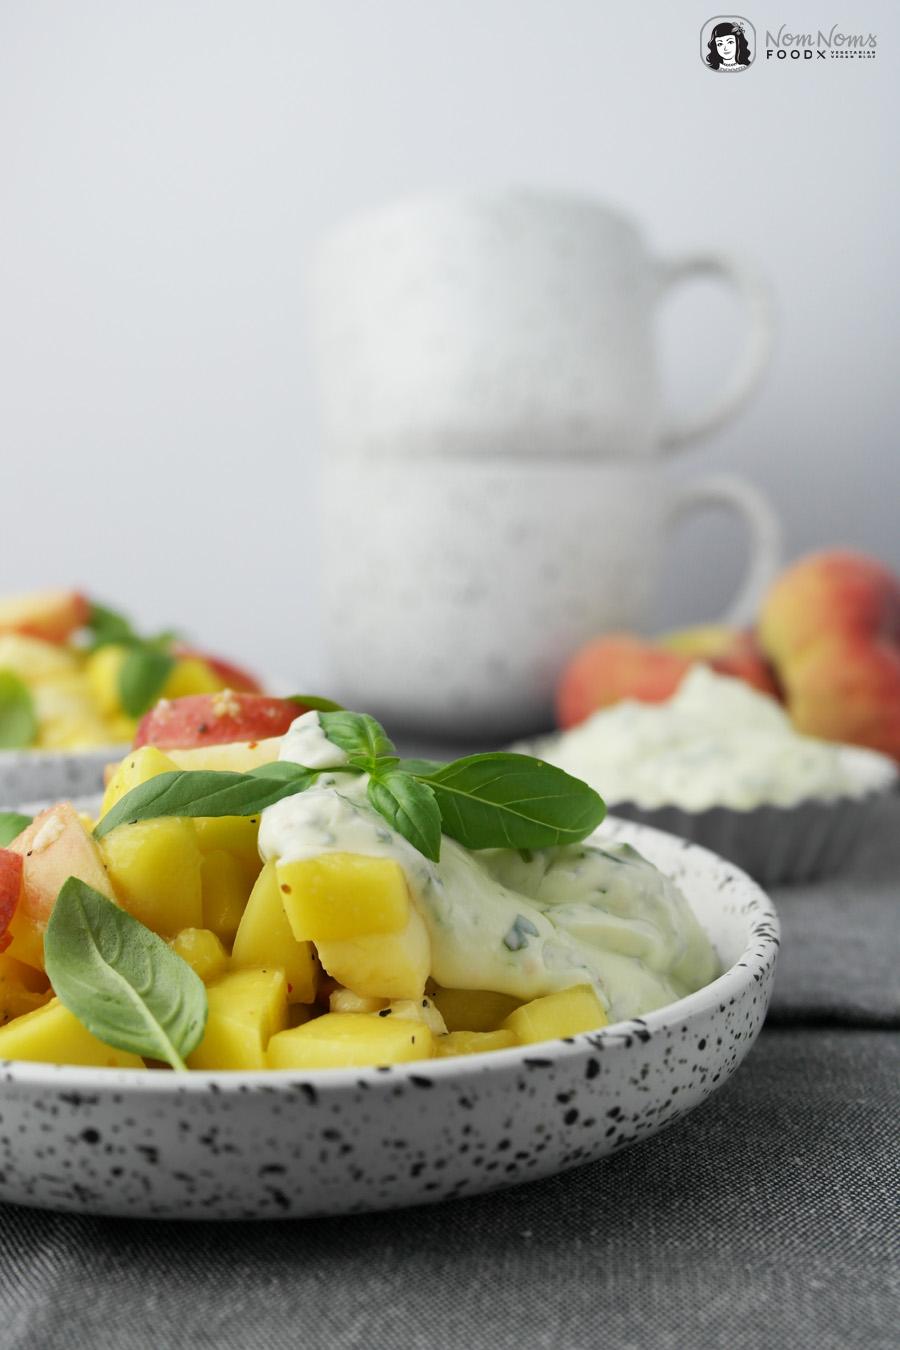 Sommer-Salat: Mango-Pfirsich-Mozzarella-Salat mit Pfeffer und Basilikum-Dressing